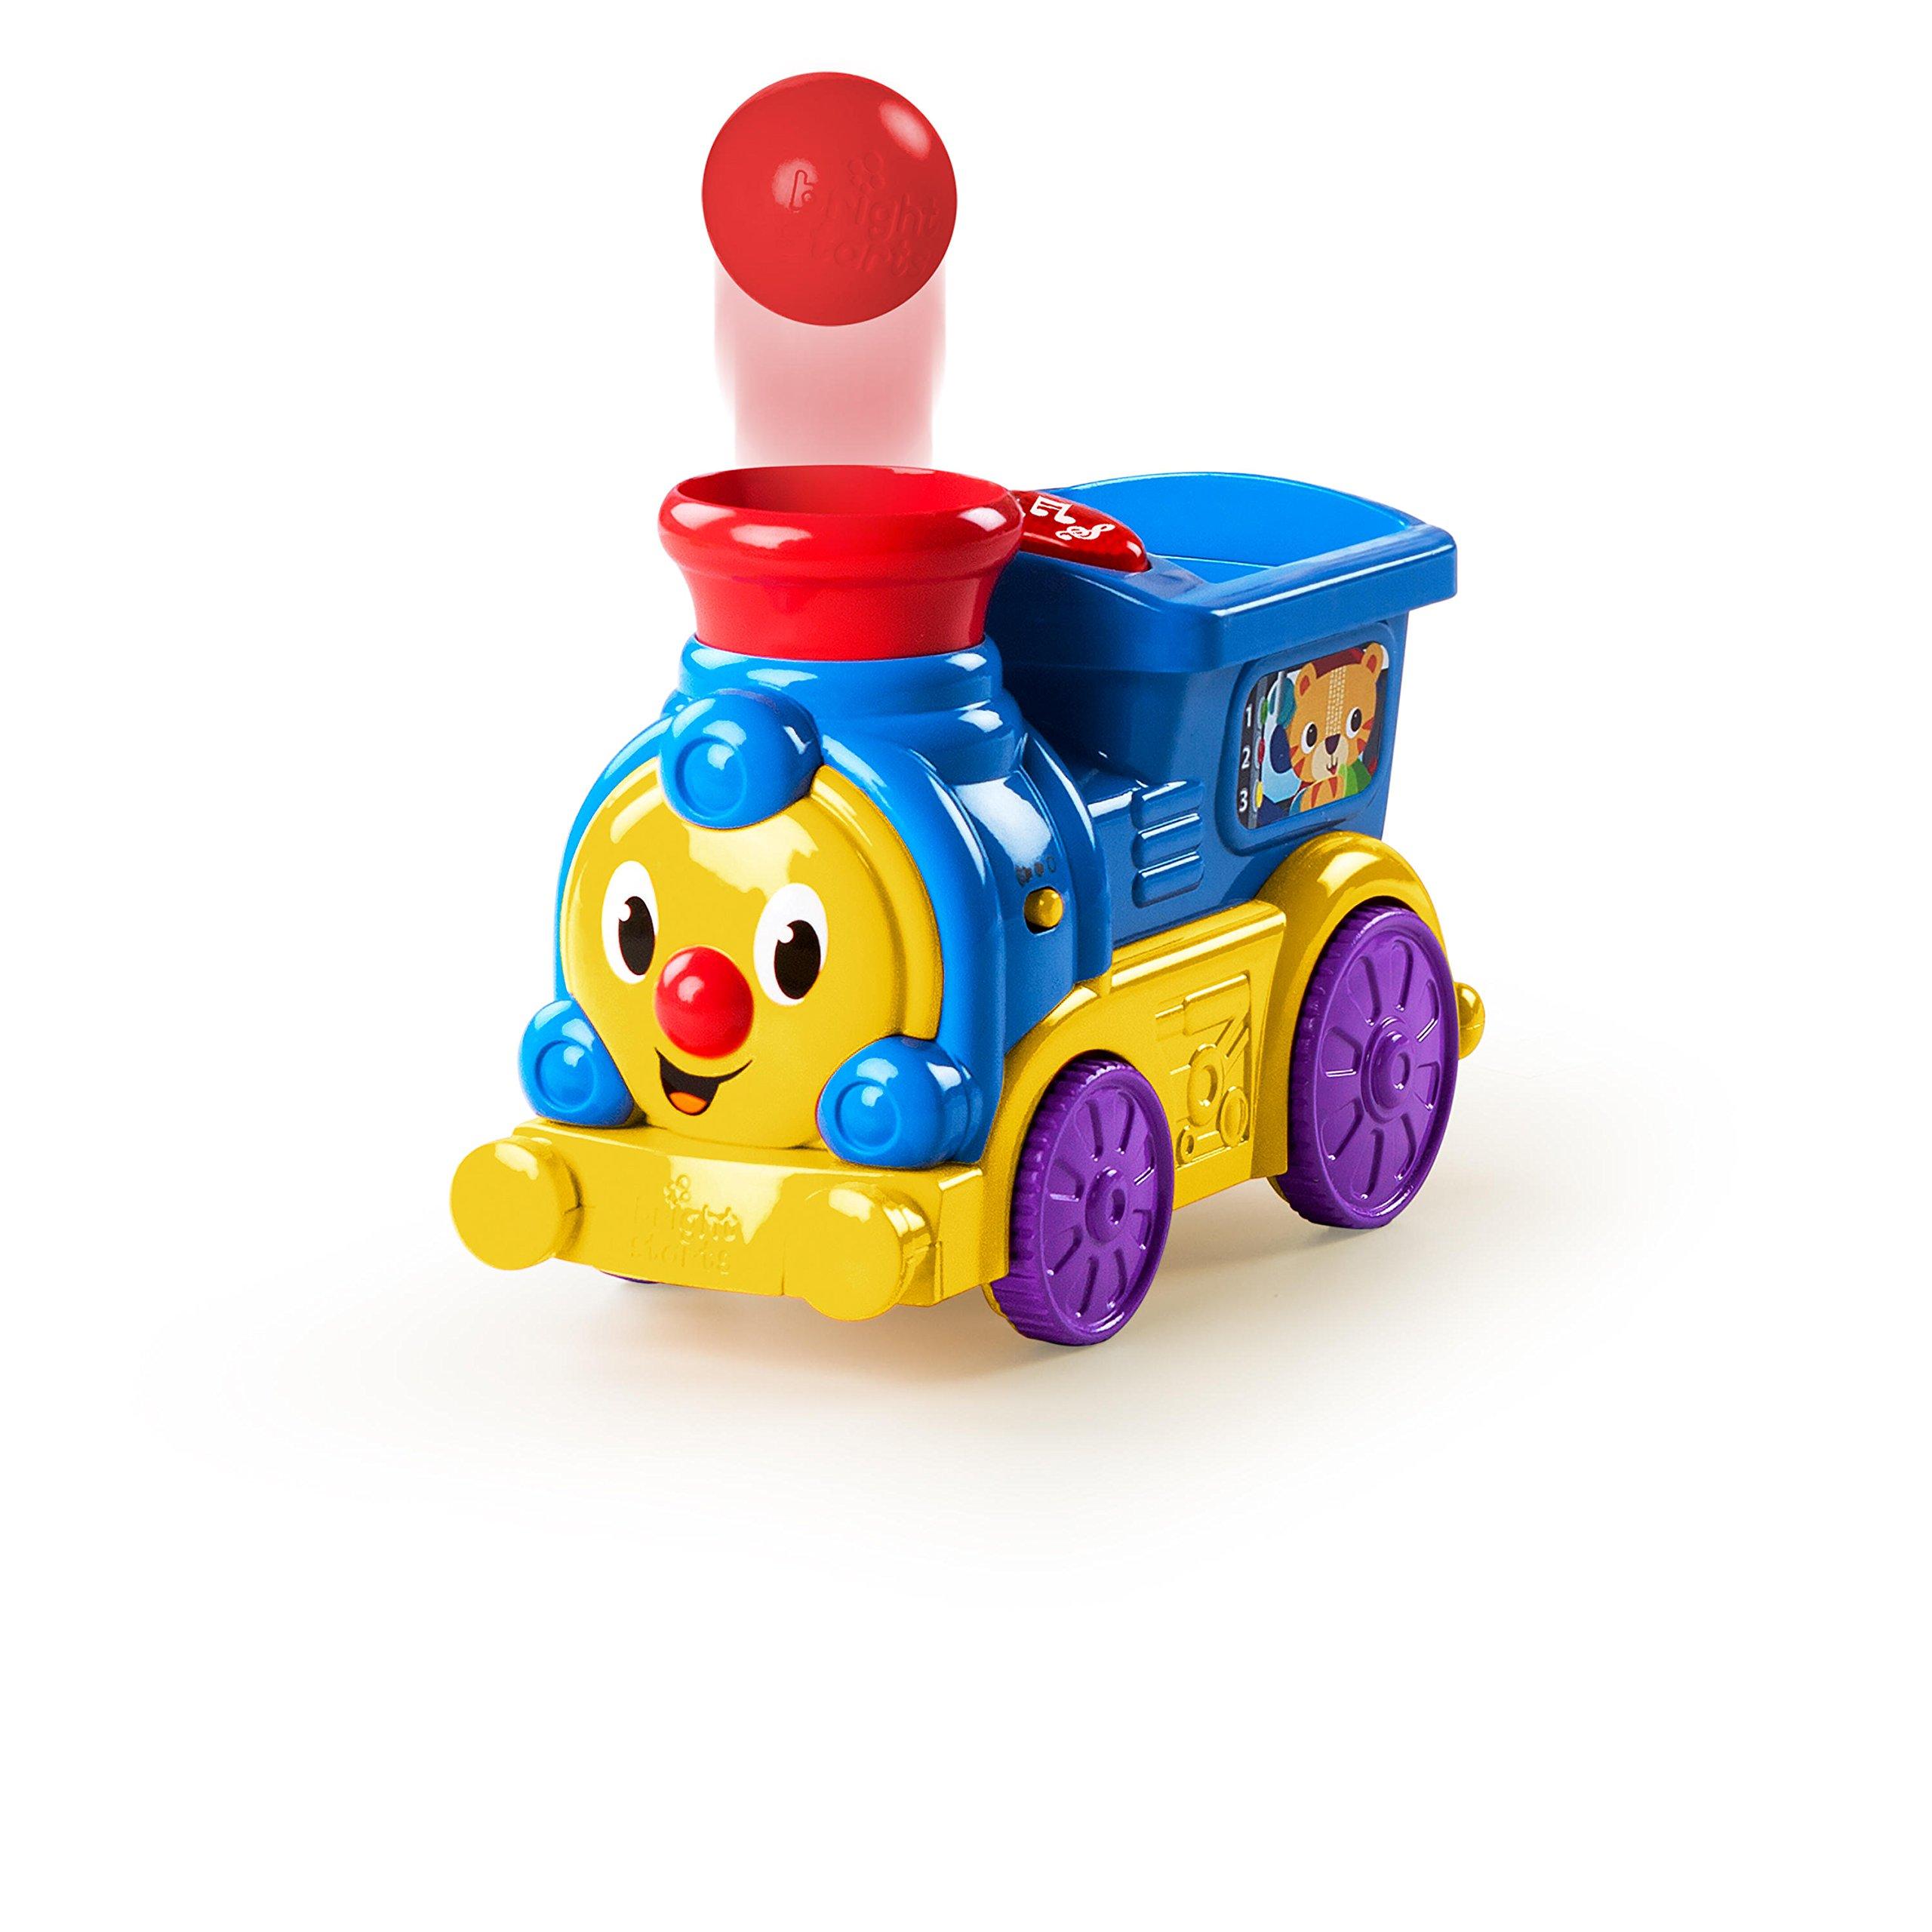 Bright Starts Roll & Pop Train Toy